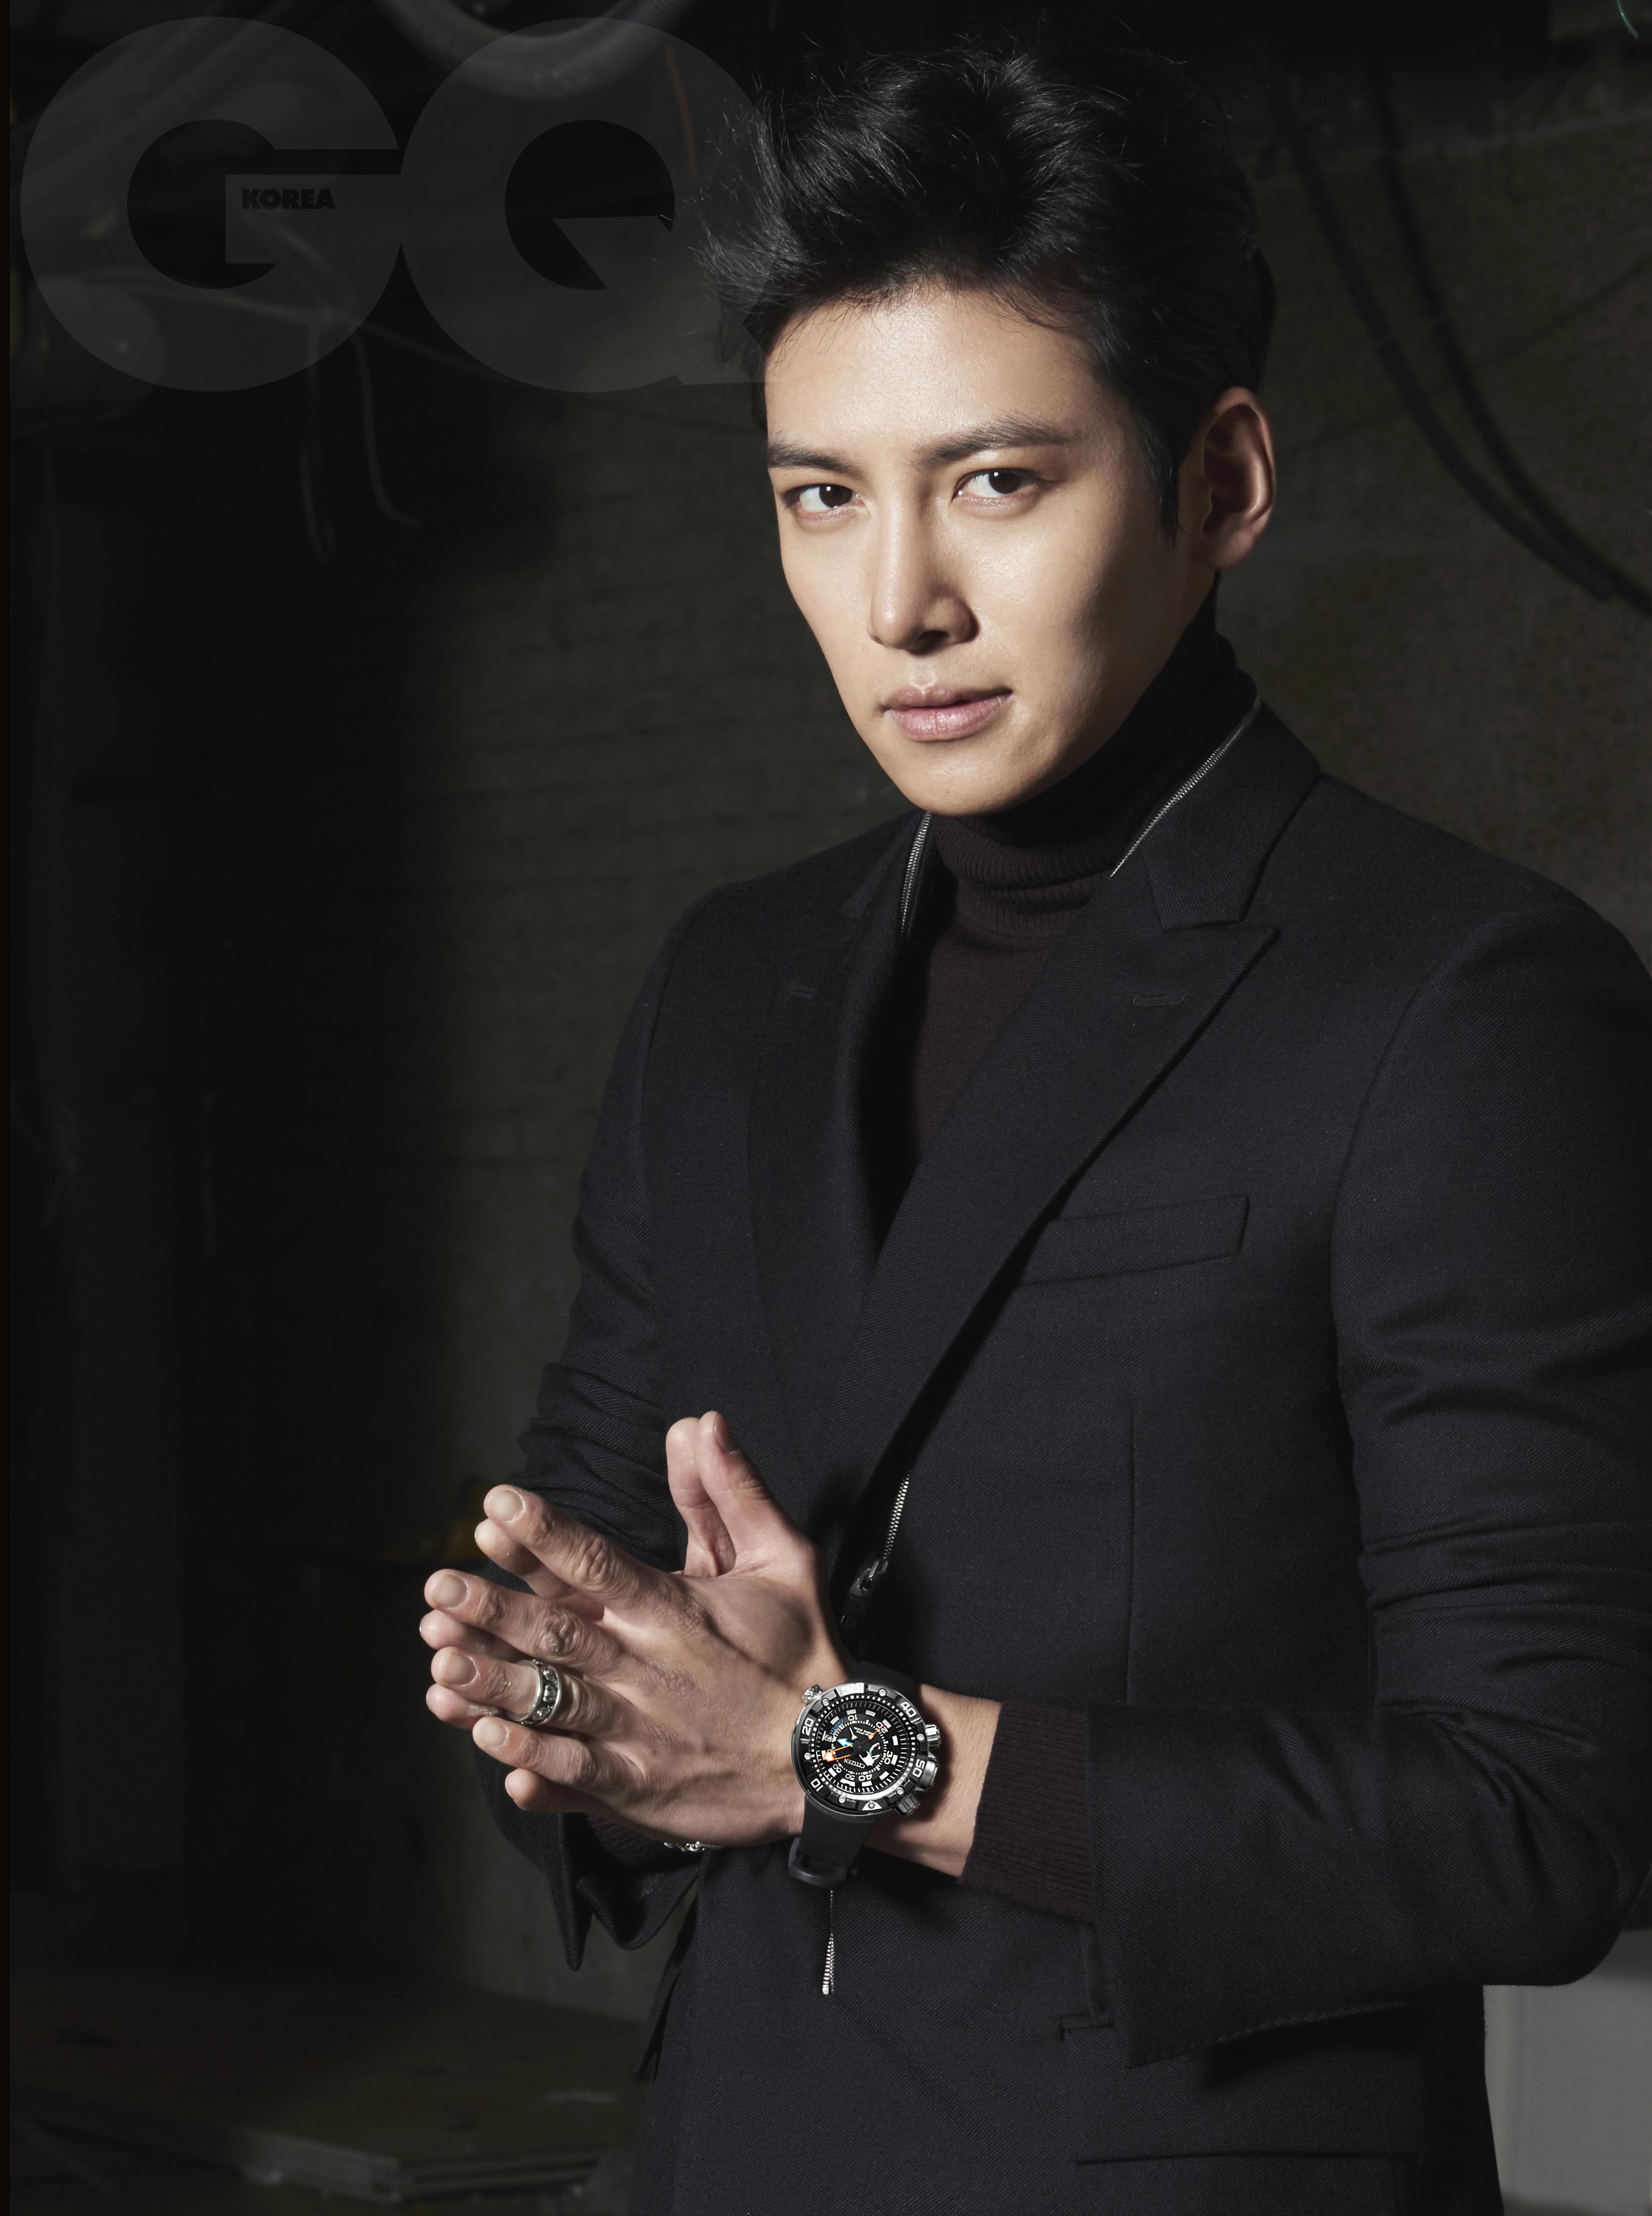 Ji Chang Wook Android Iphone Wallpaper Asiachan Kpop Jpop Image Board